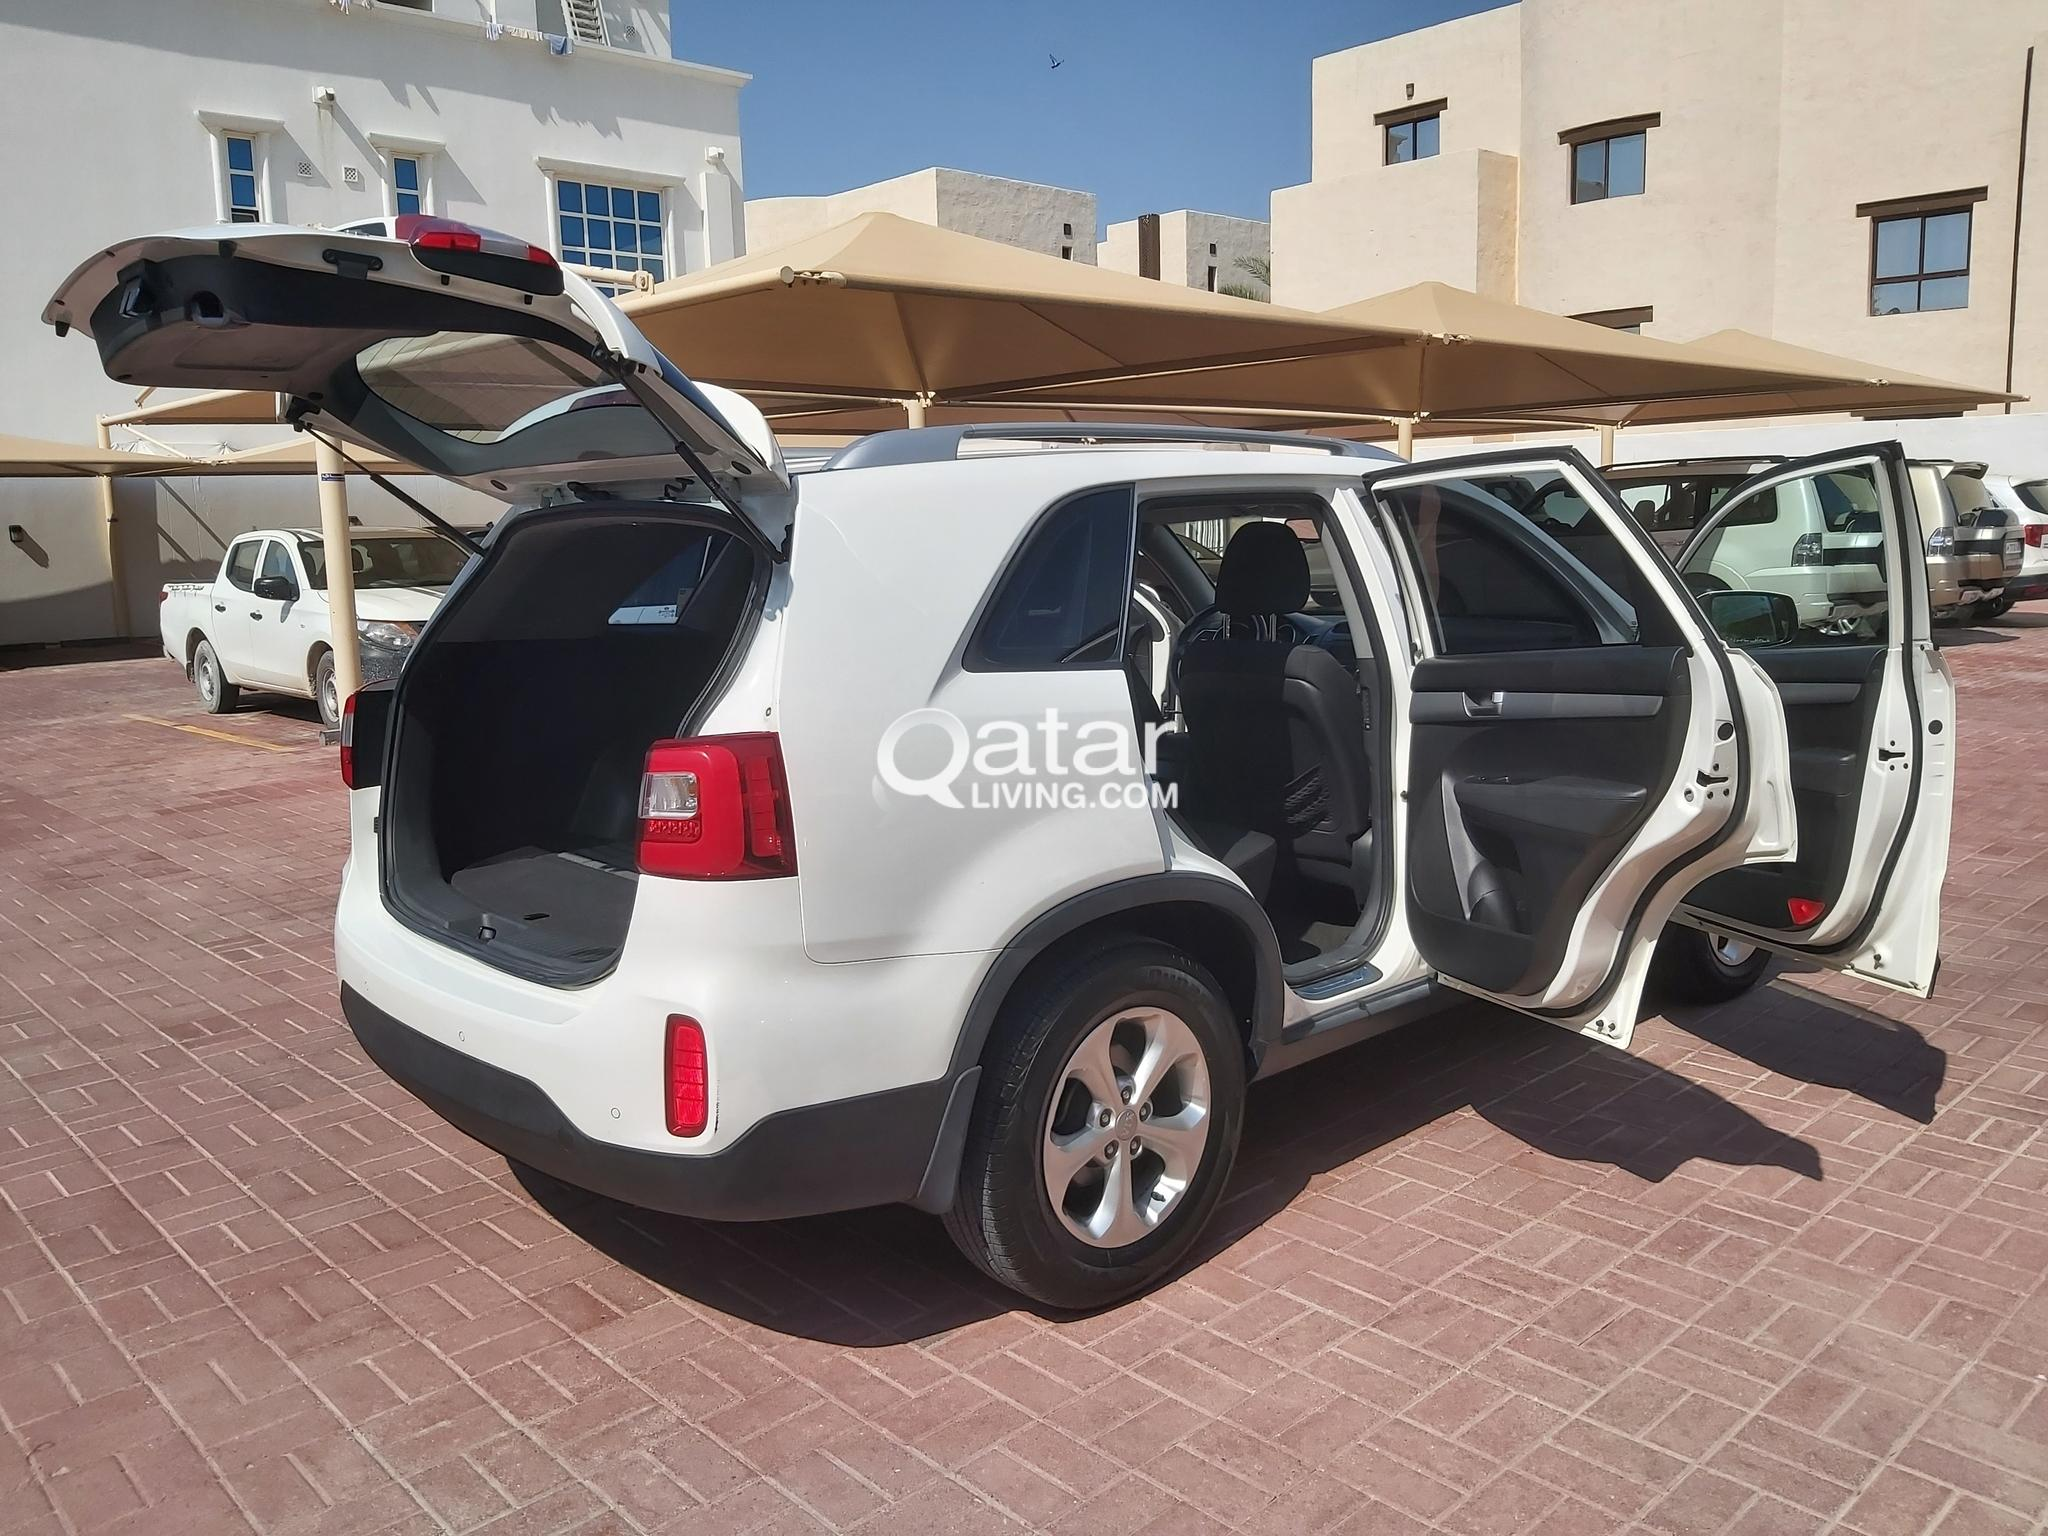 KIA SORENTO 2013 | Qatar Living